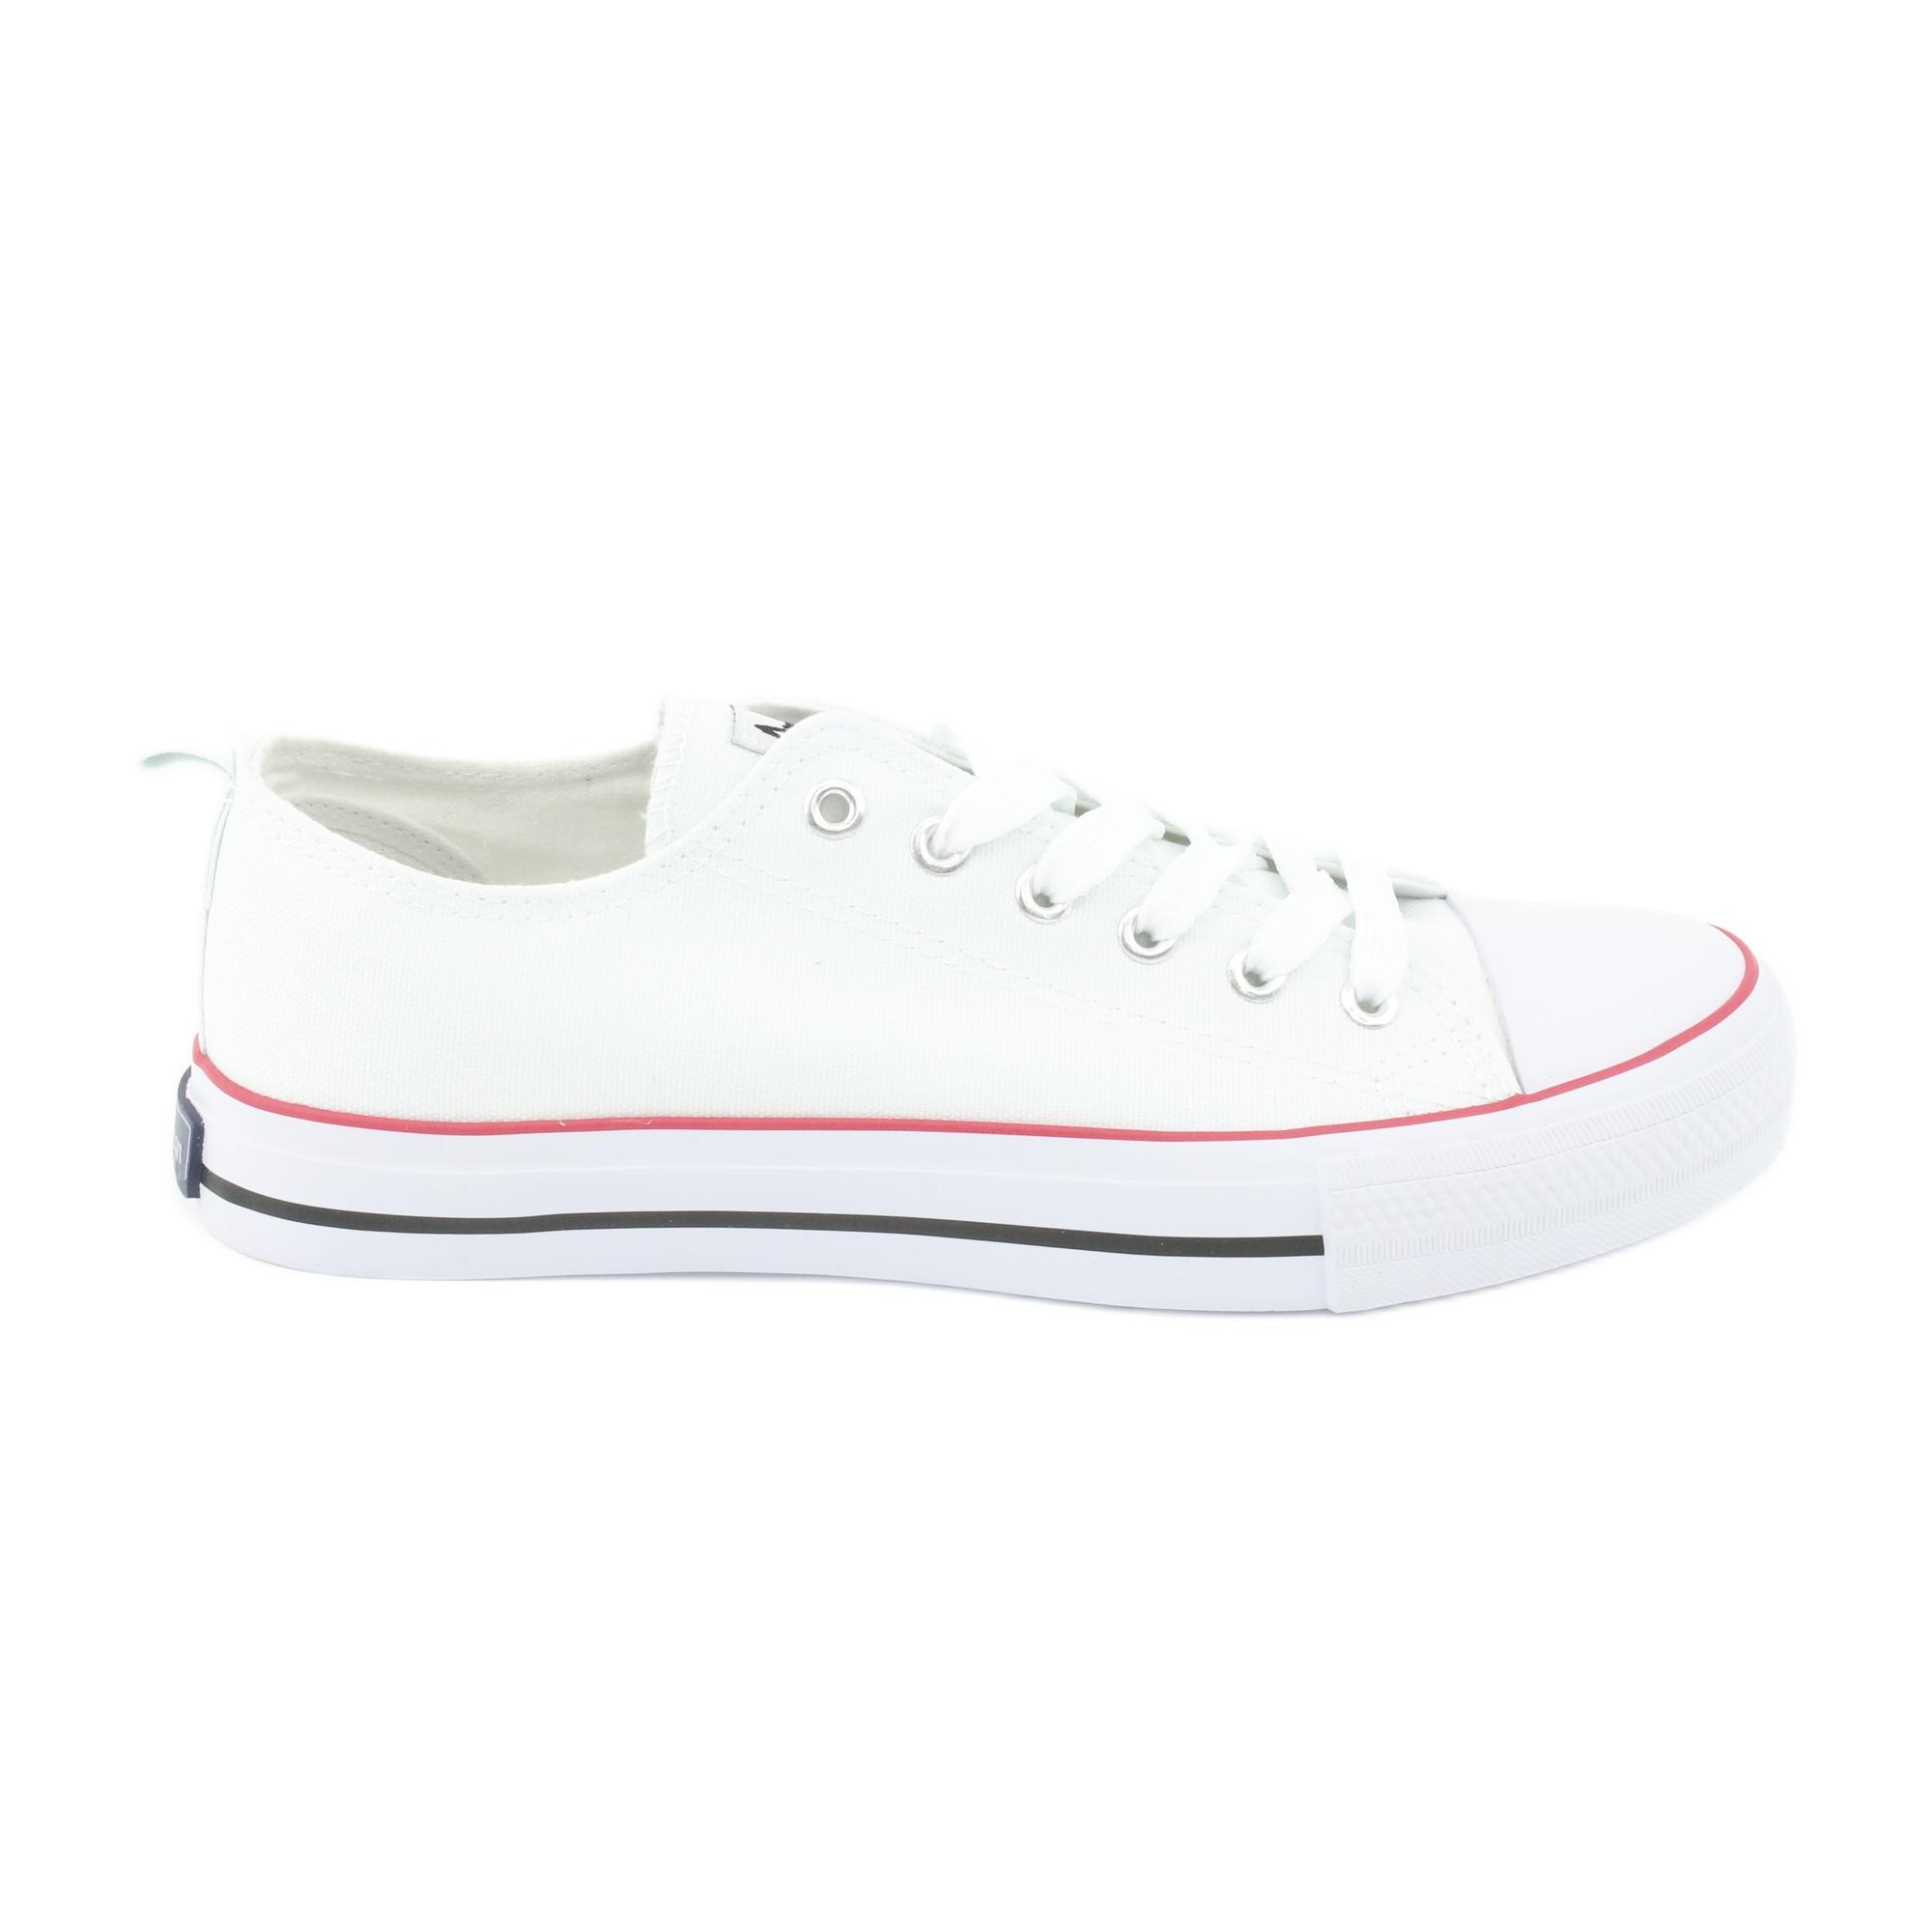 American Club Amerikai cipők cipők férfi cipő ButyModne.pl